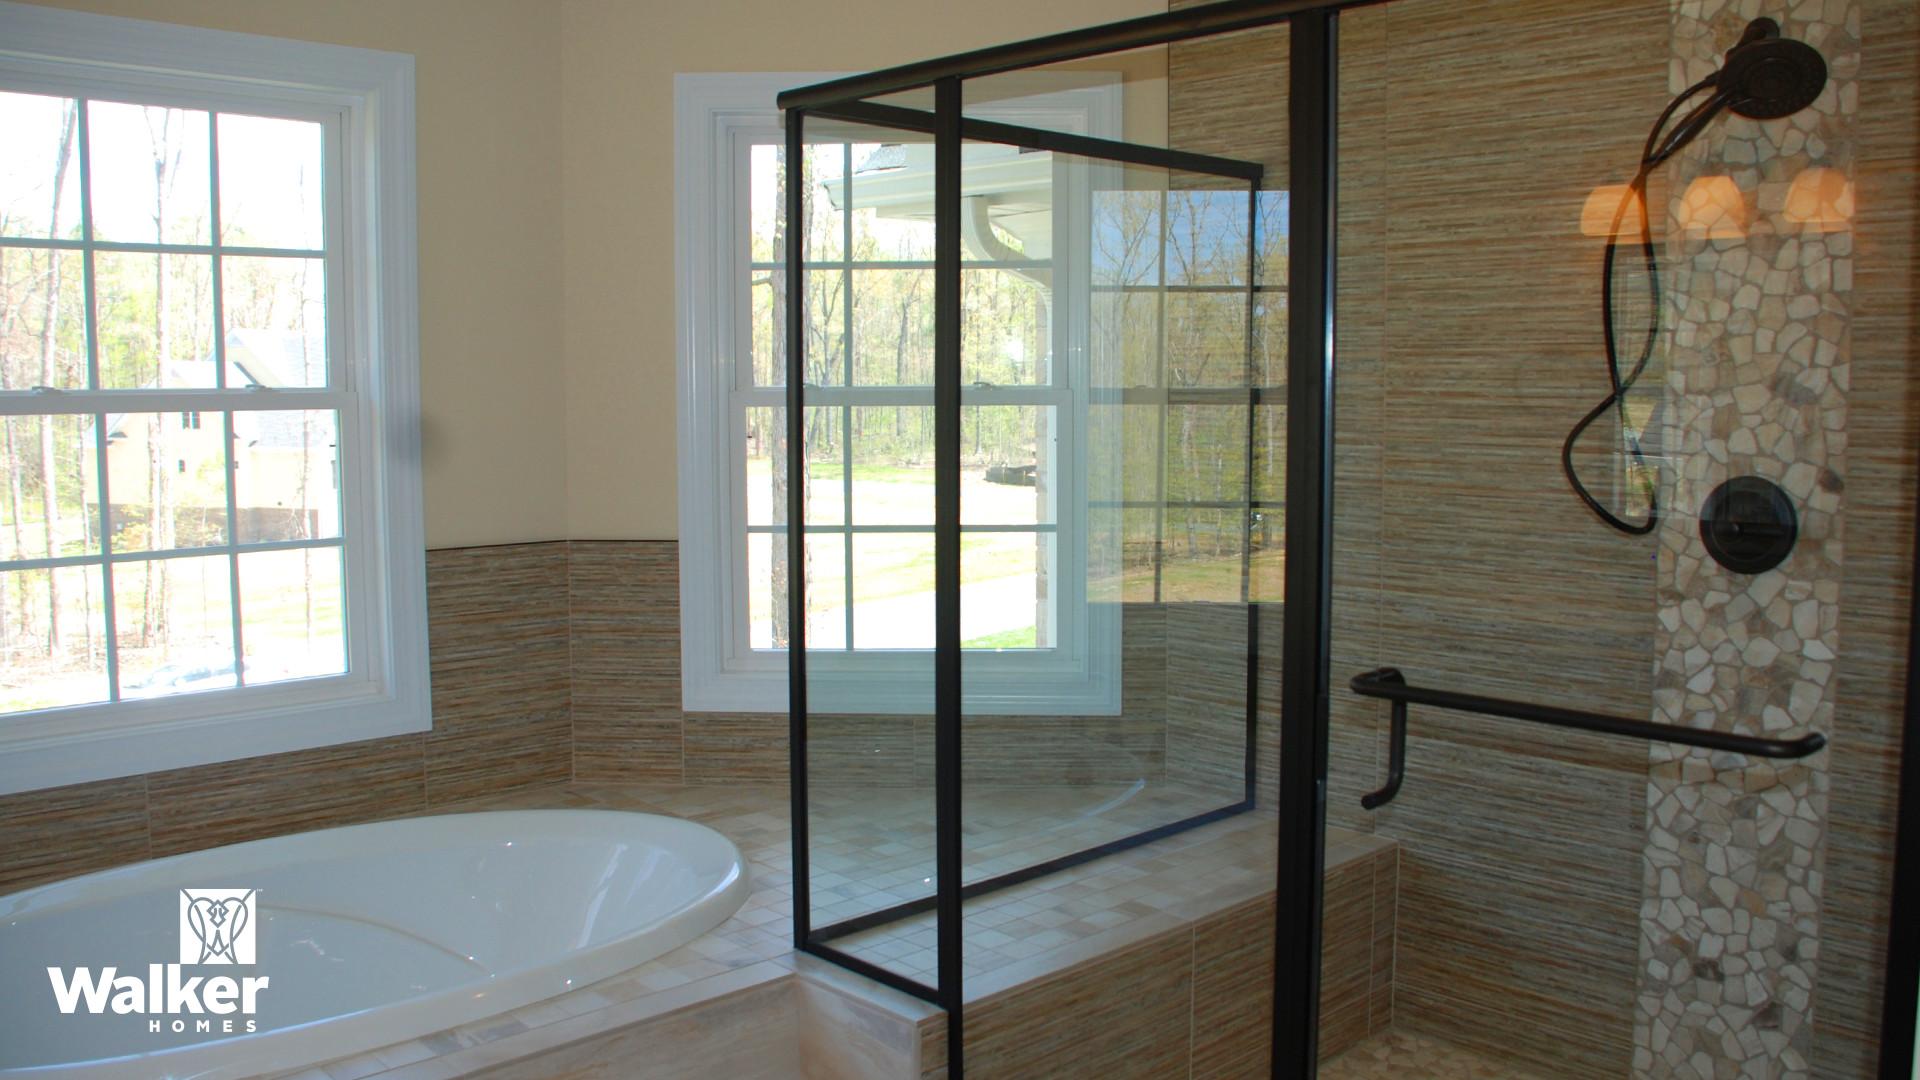 A Master Bath from a custom home design by Walker Homes in Glen Allen, Virginia